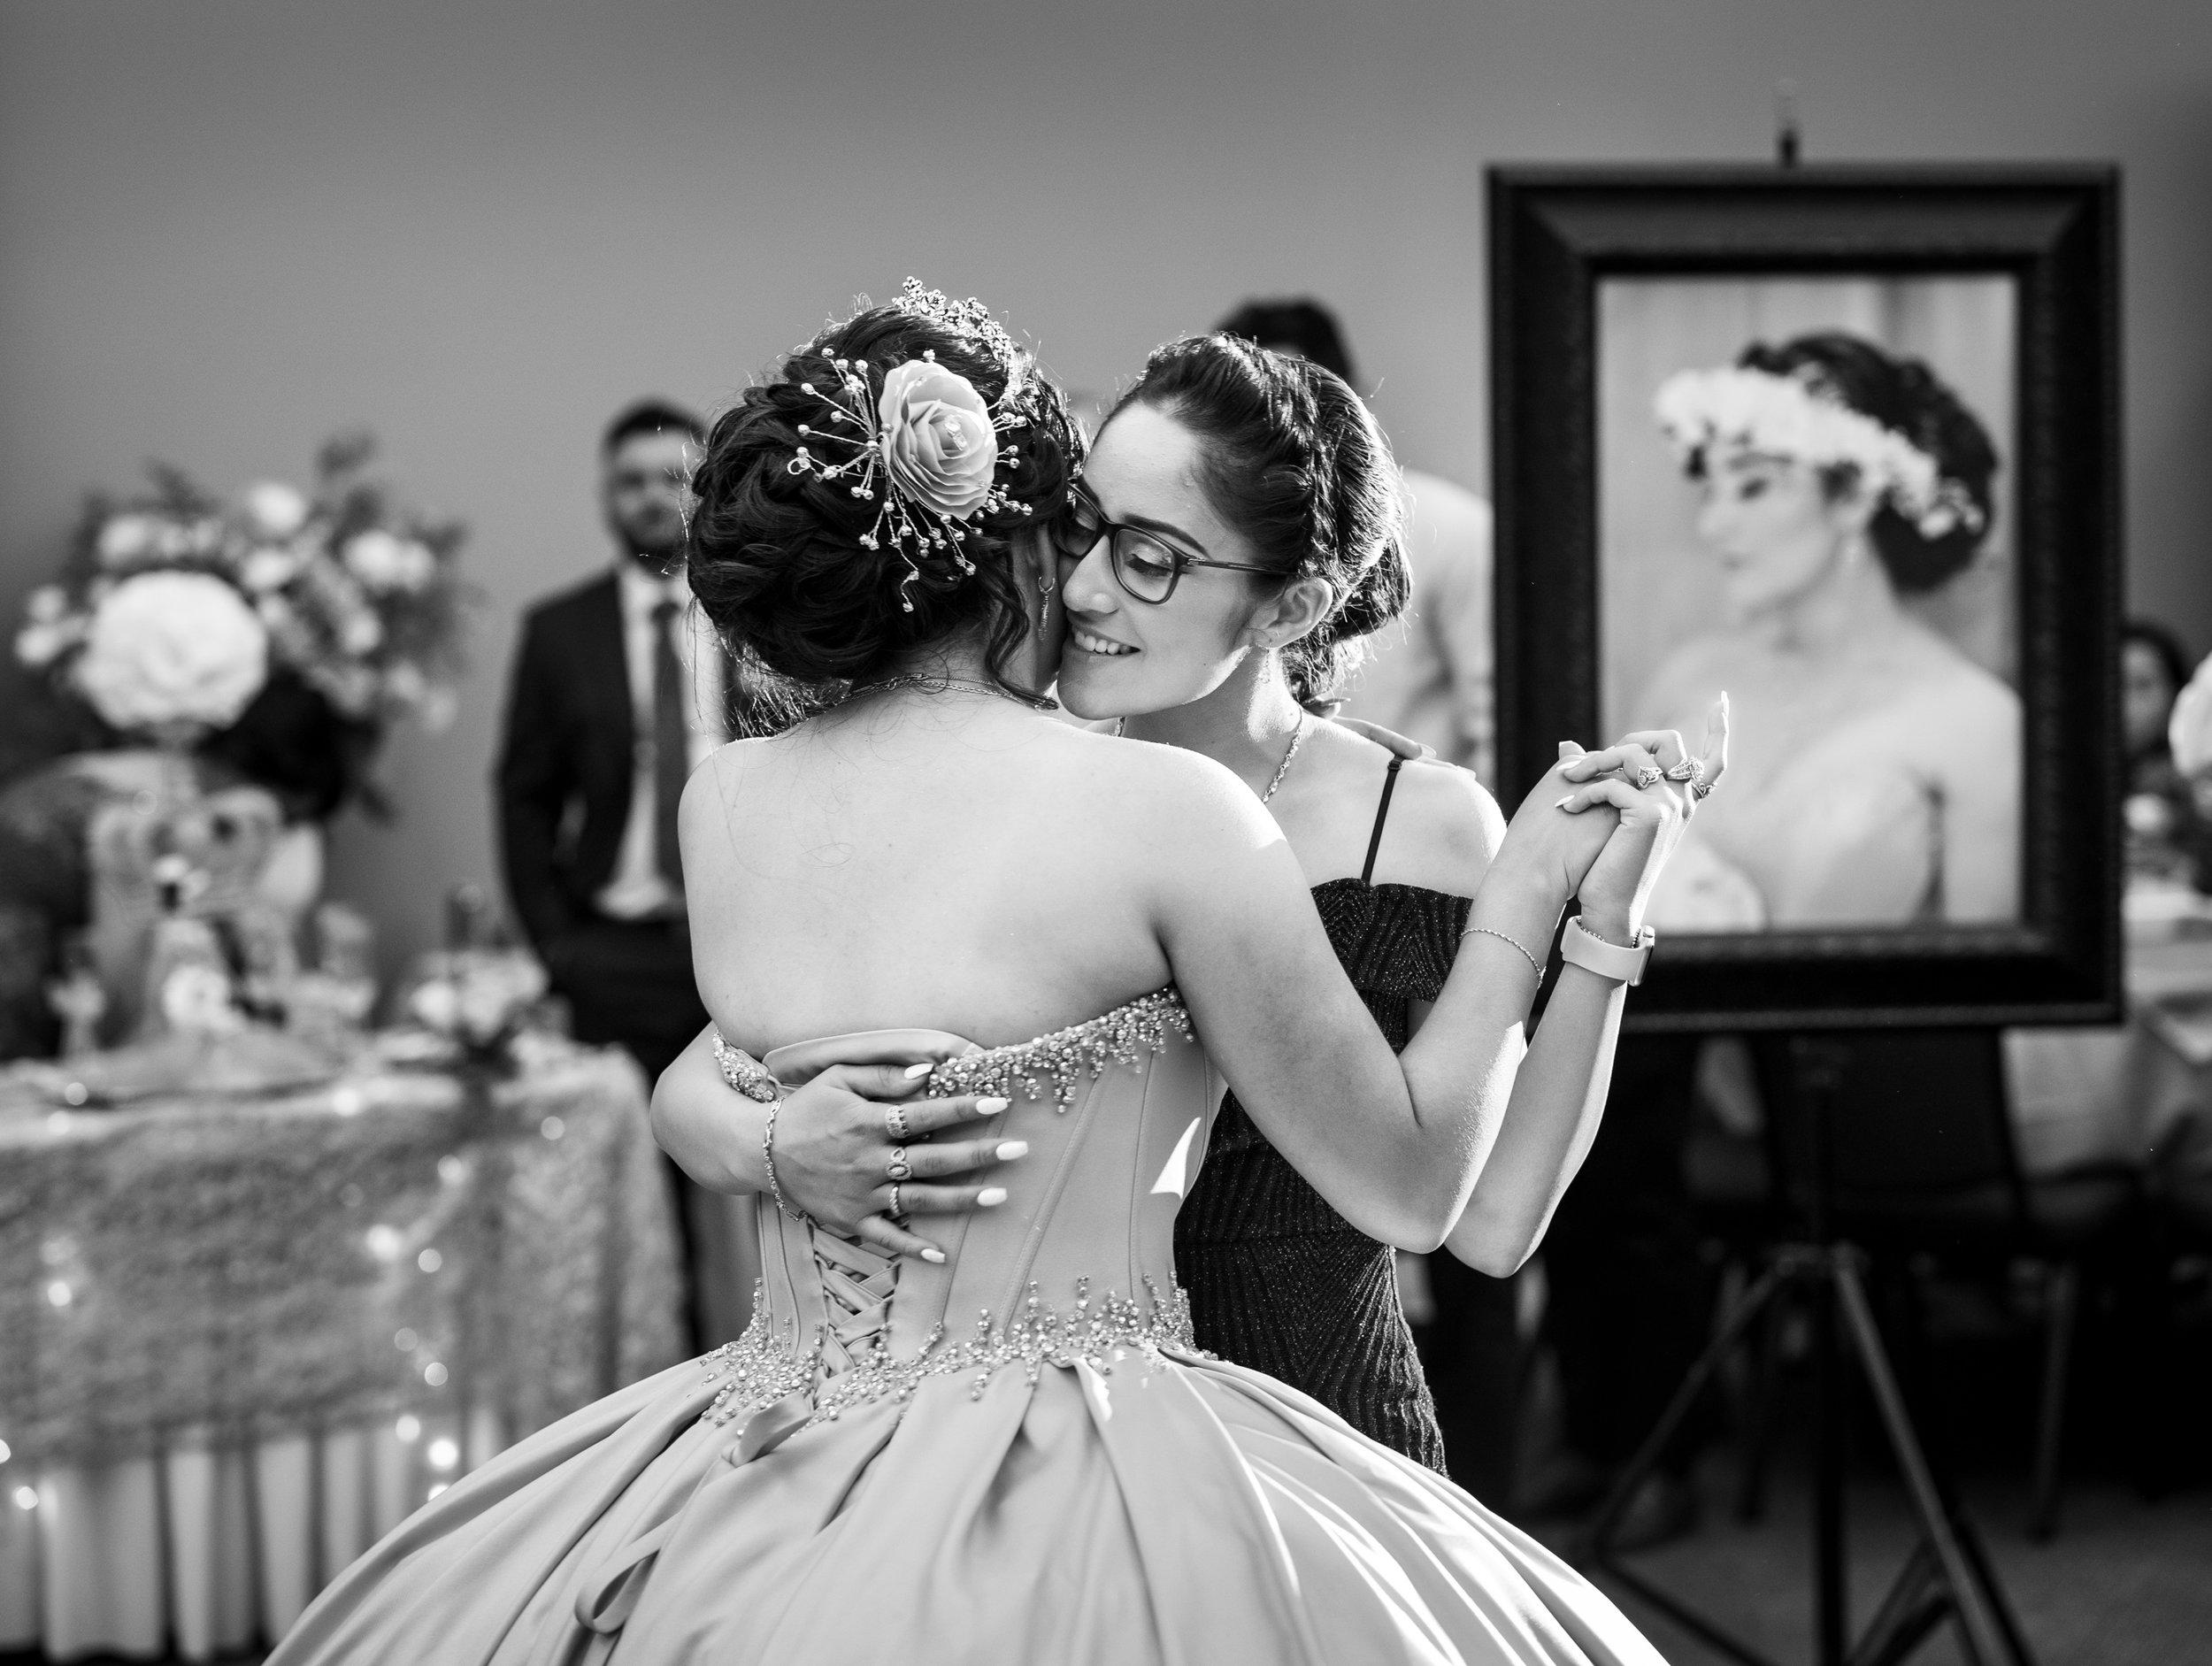 Adriana Gonzalez dances with her sister Paola Gonzalez during Adriana's quinceañera in Sacramento, California